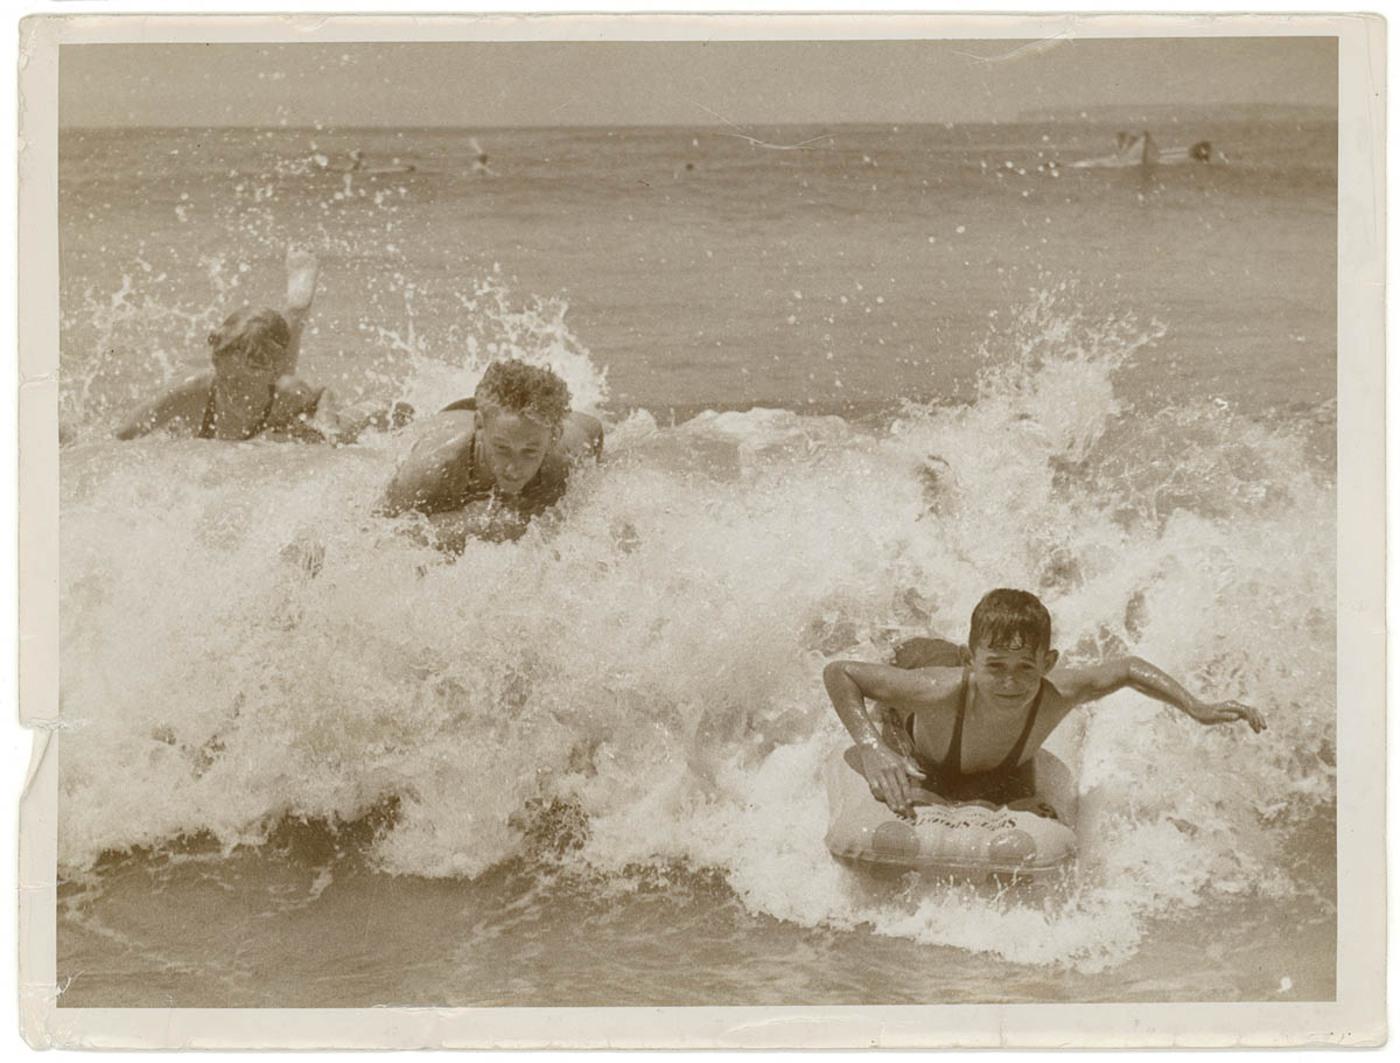 Surfoplane riding at a Sydney beach, 193- / Sam Hood